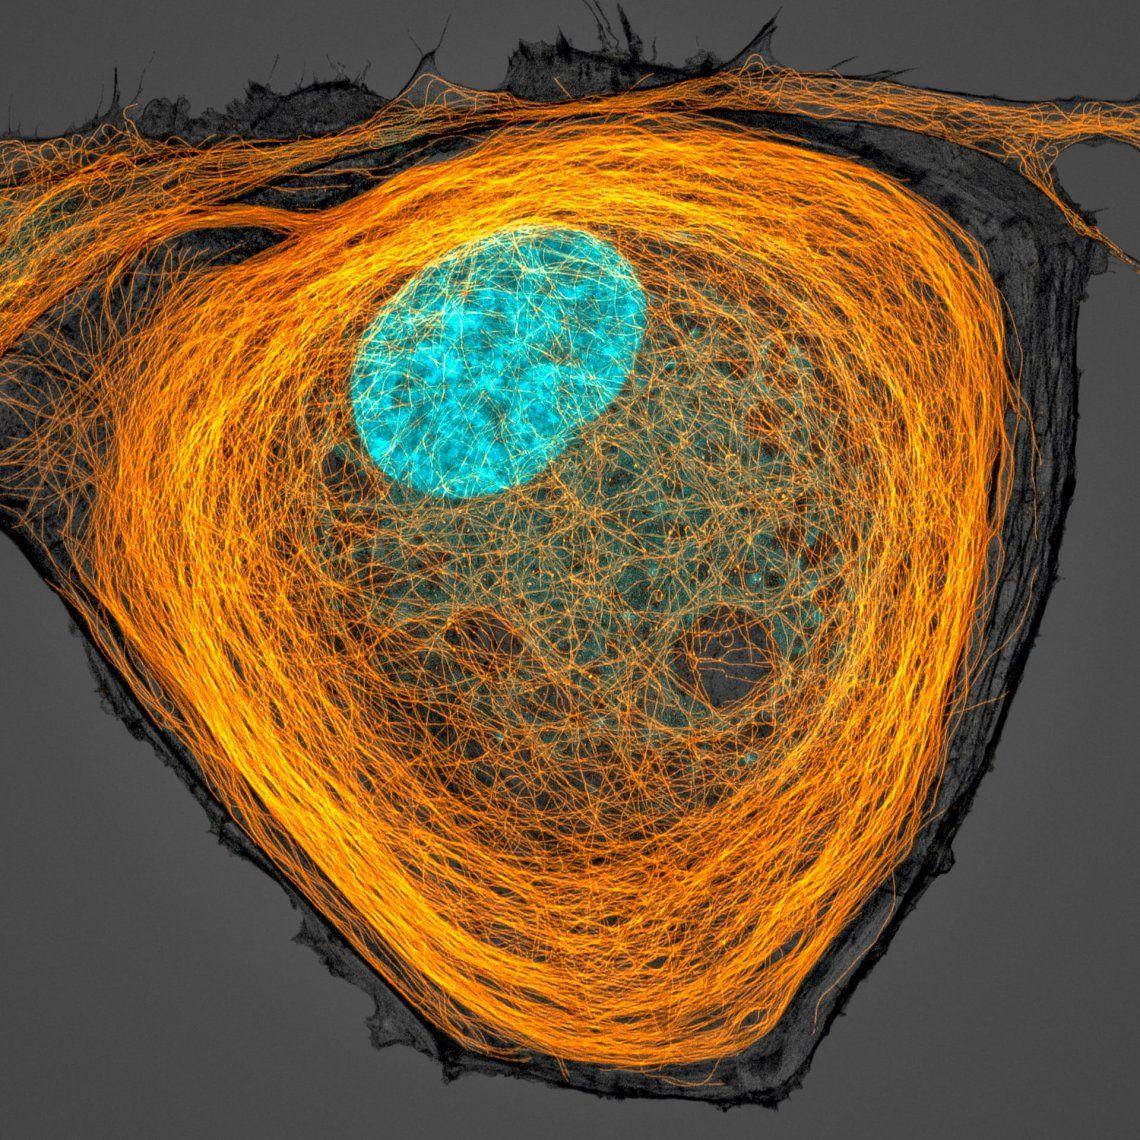 7º puesto | Jason Kirk | Microtúbulos (naranja) dentro de una célula